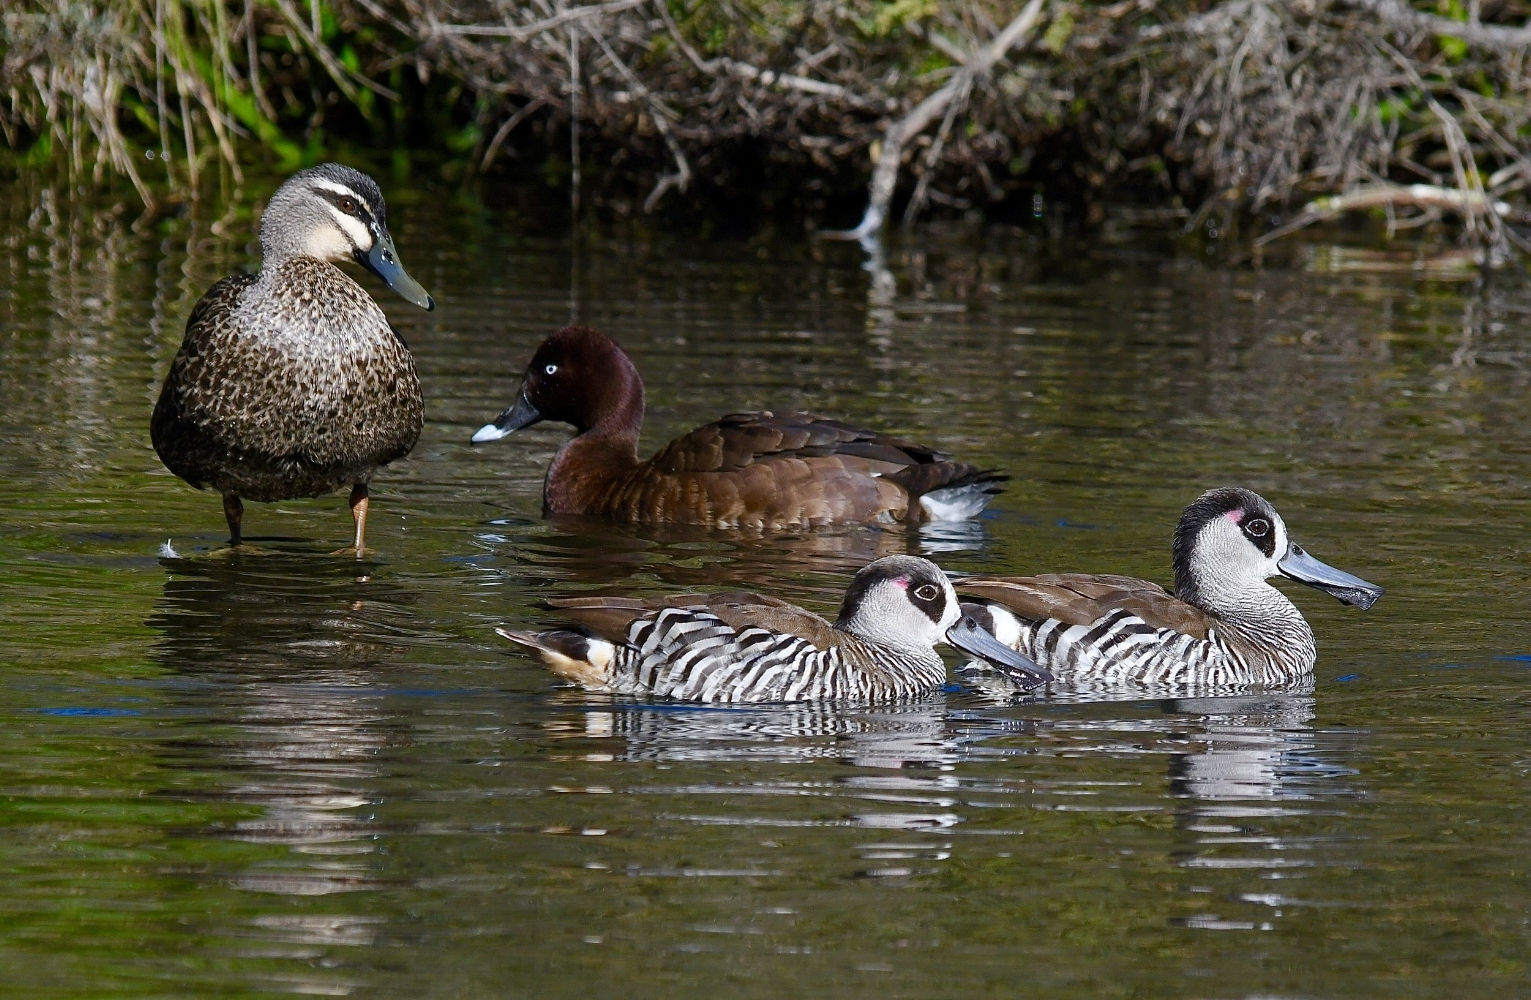 Pacific Black Duck, Hardhead and Pink-eared Ducks